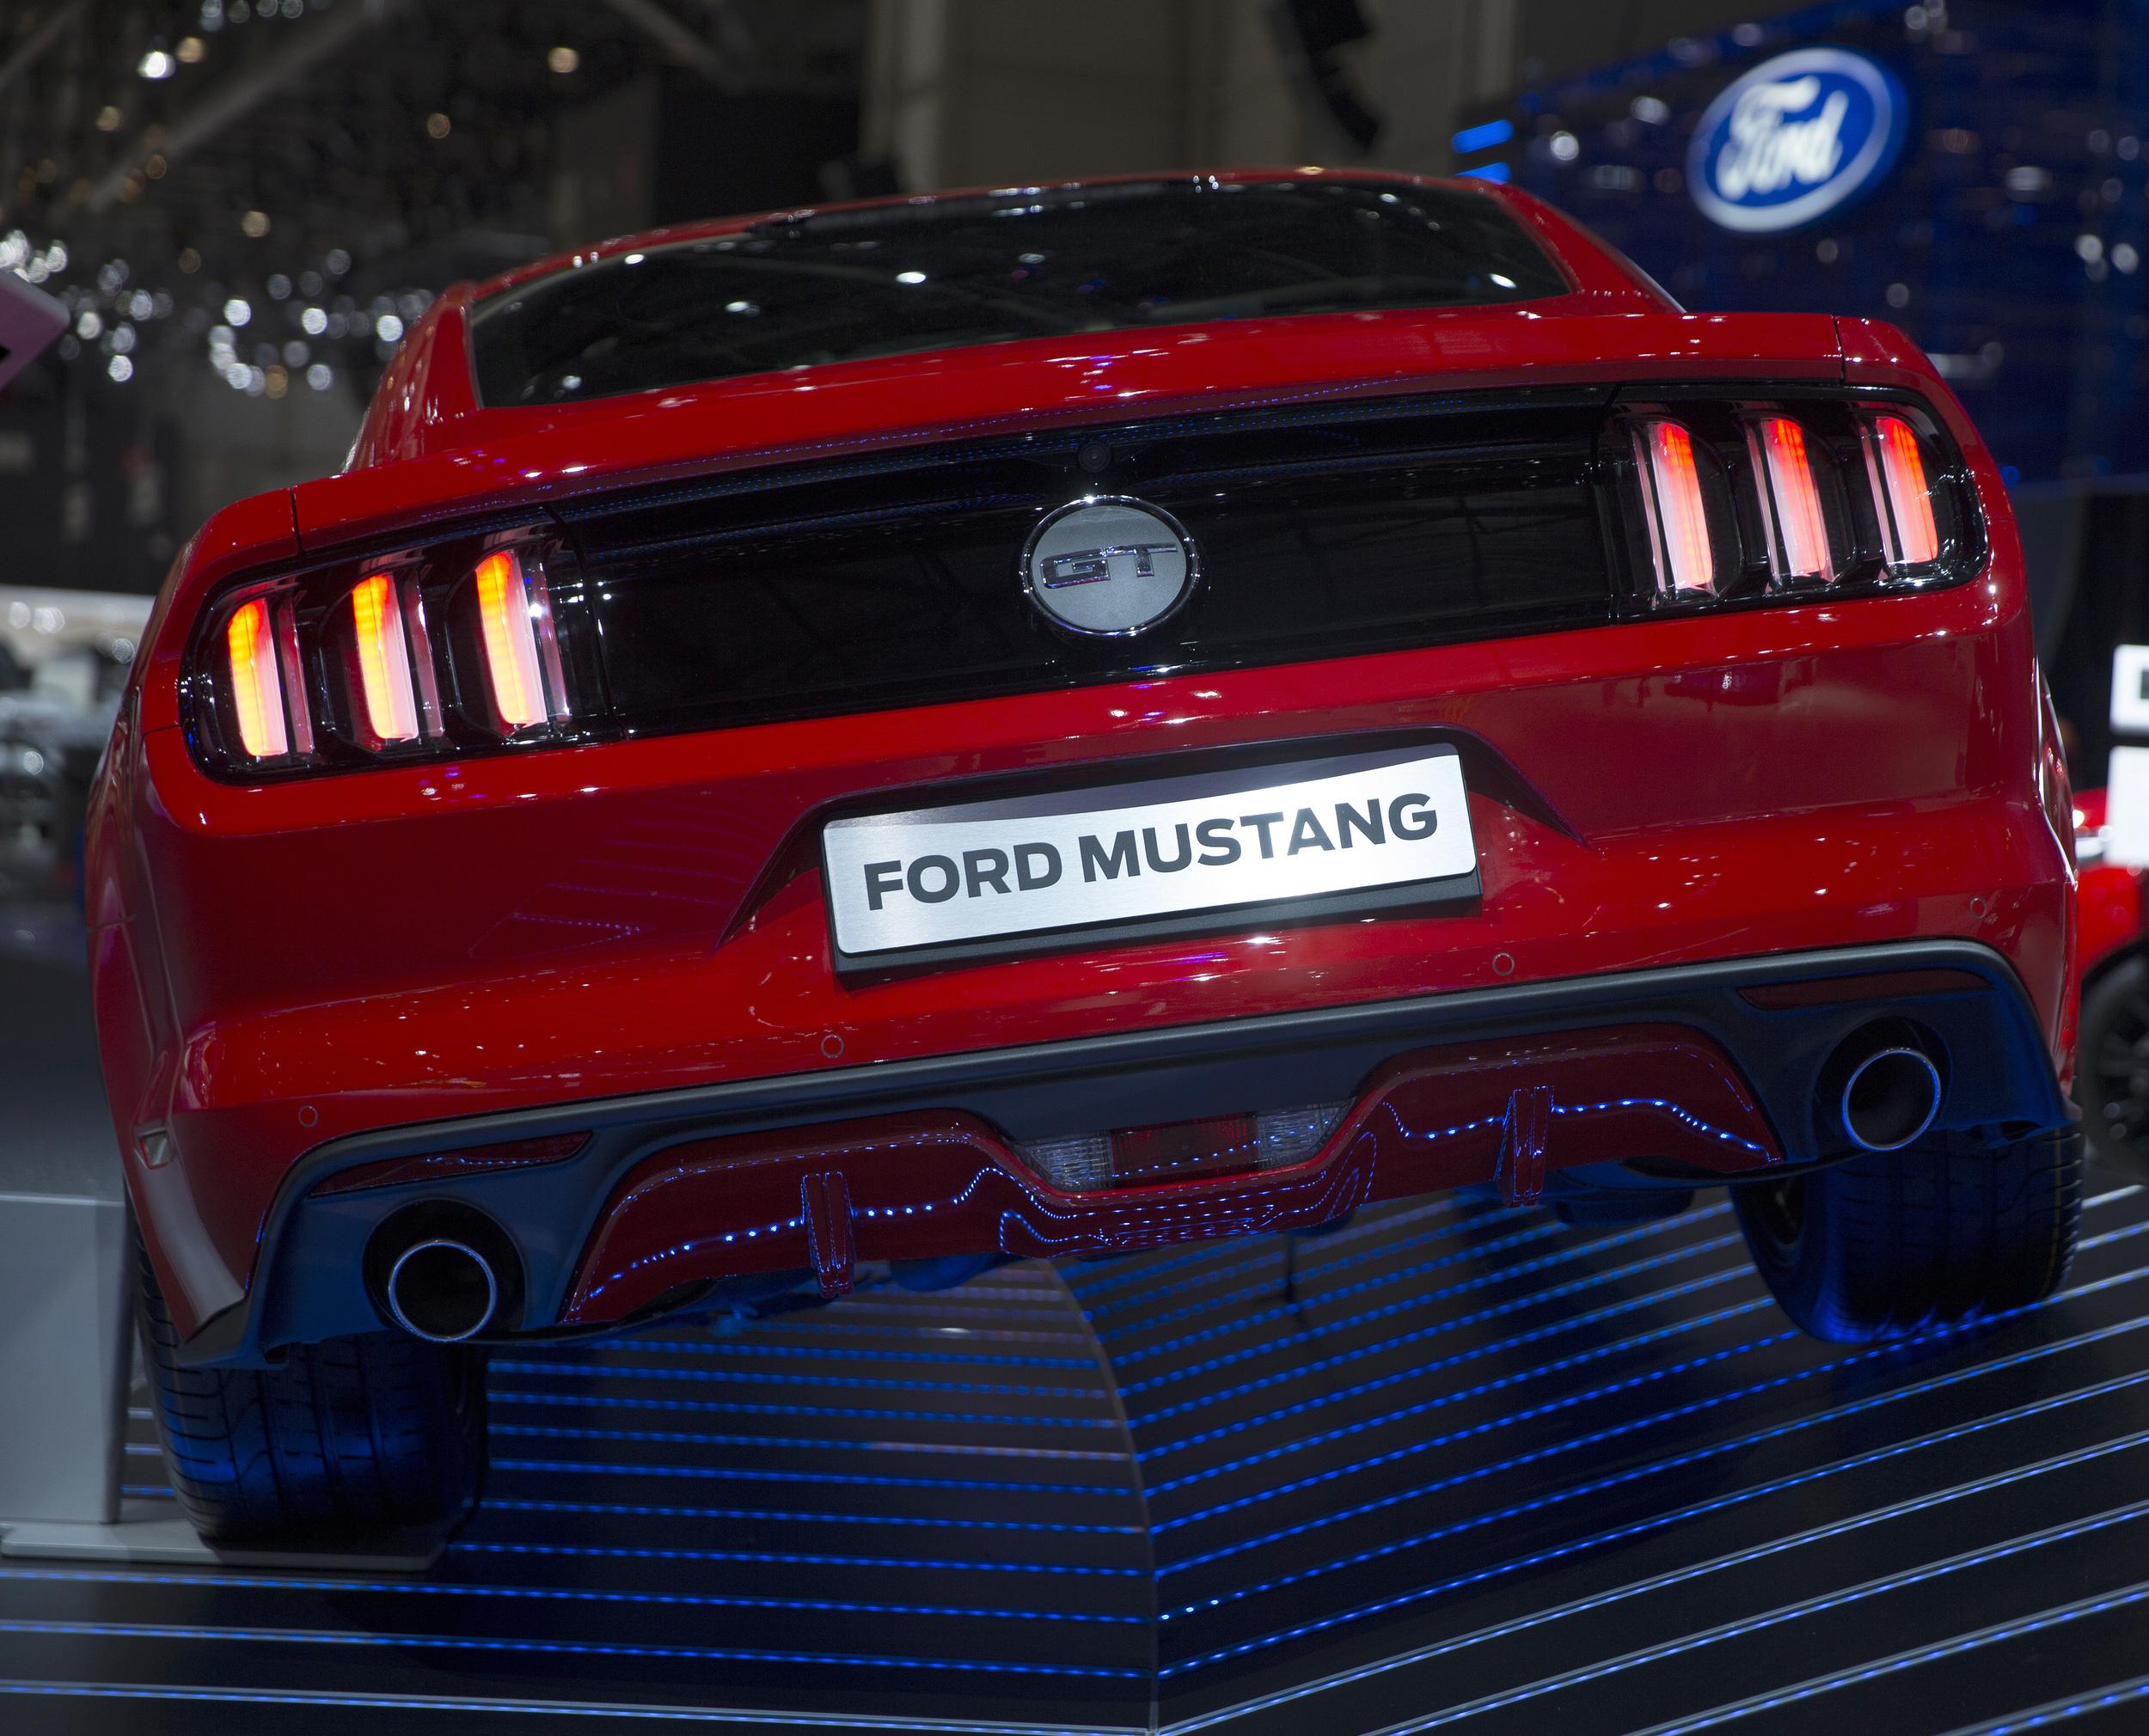 Ford @ GENEVA MOTOR SHOW